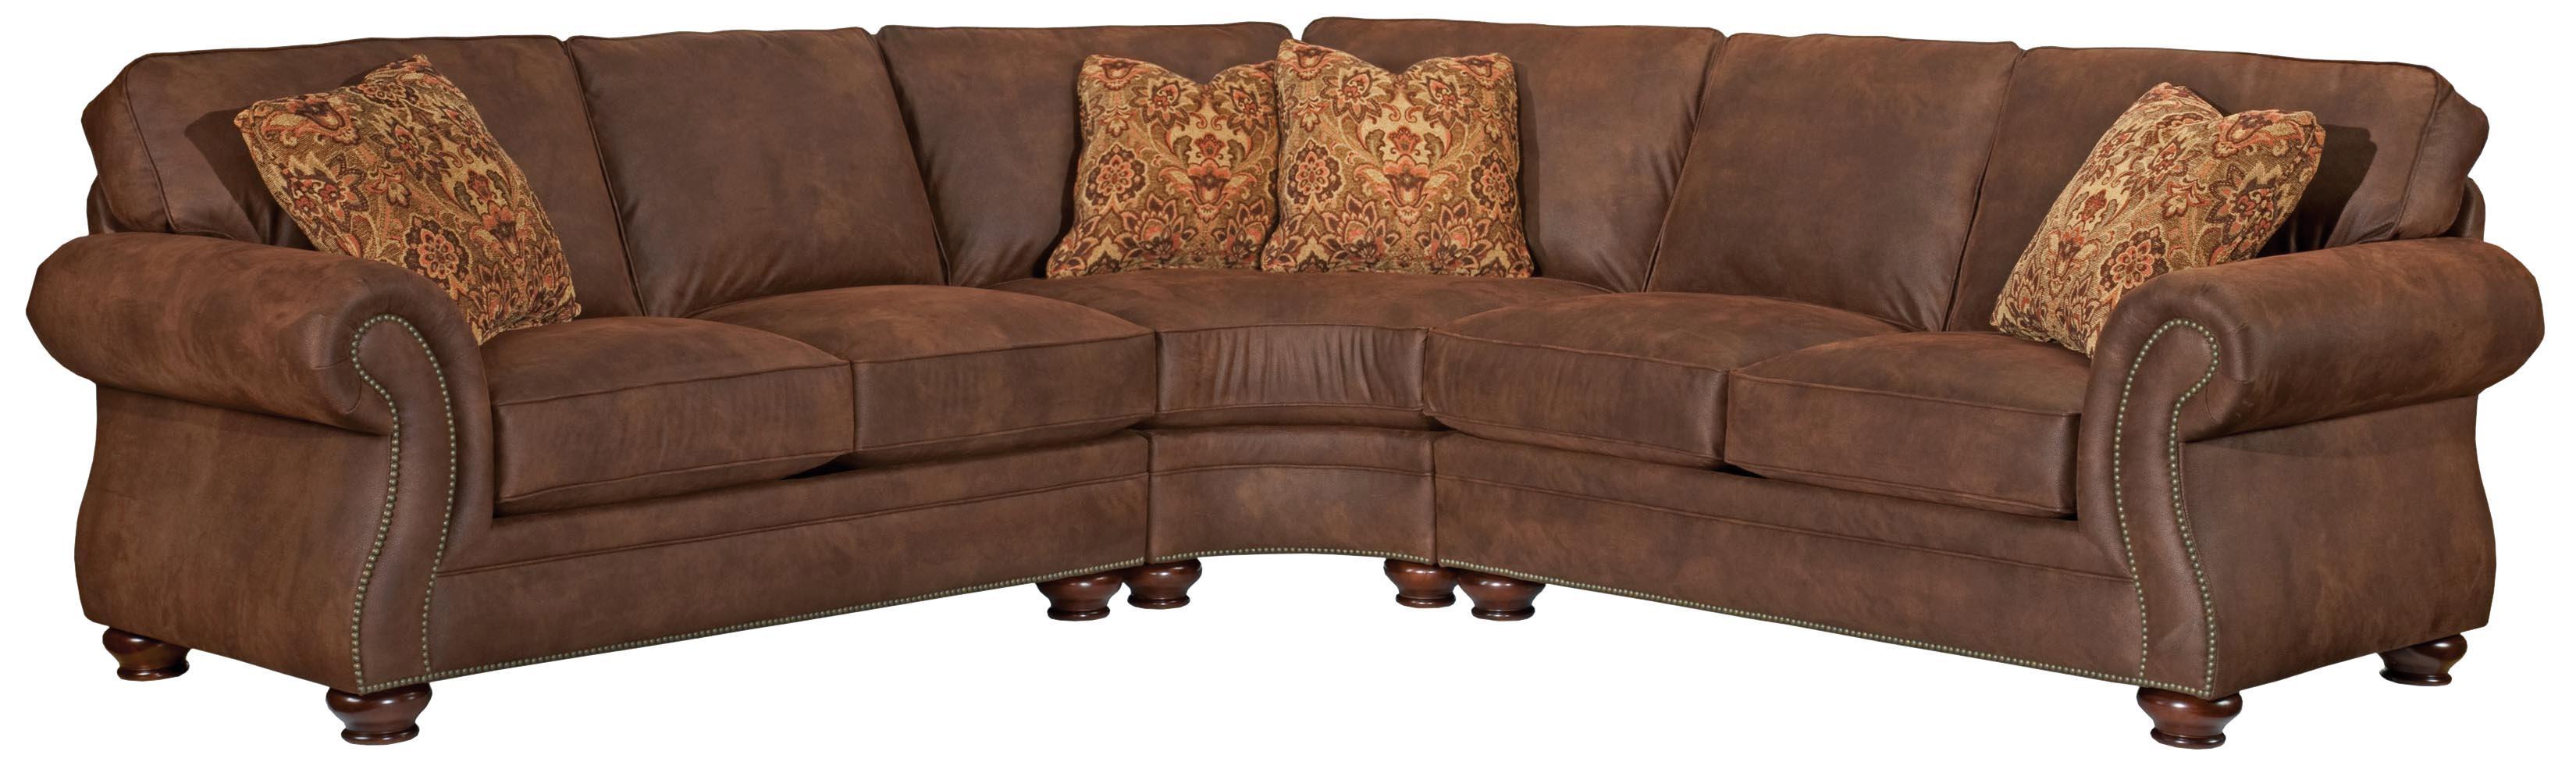 Broyhill Furniture Laramie 3 Piece Wedge Sectional Sofa – Wayside Regarding Broyhill Sectional Sleeper Sofas (Image 5 of 20)